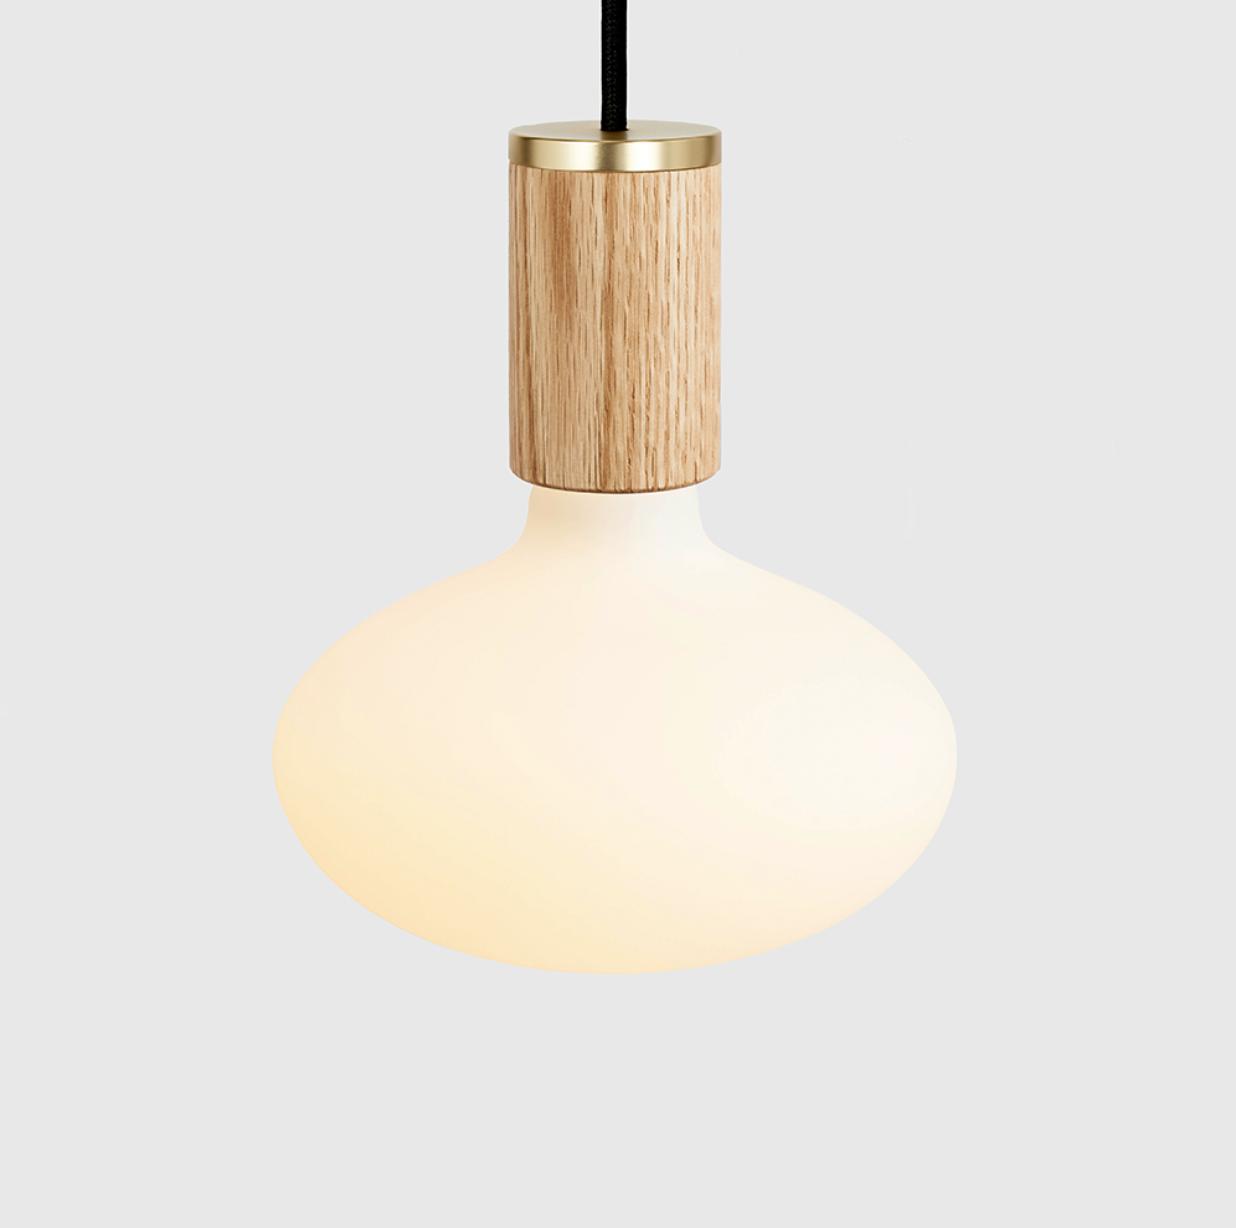 Oval Pendant Light